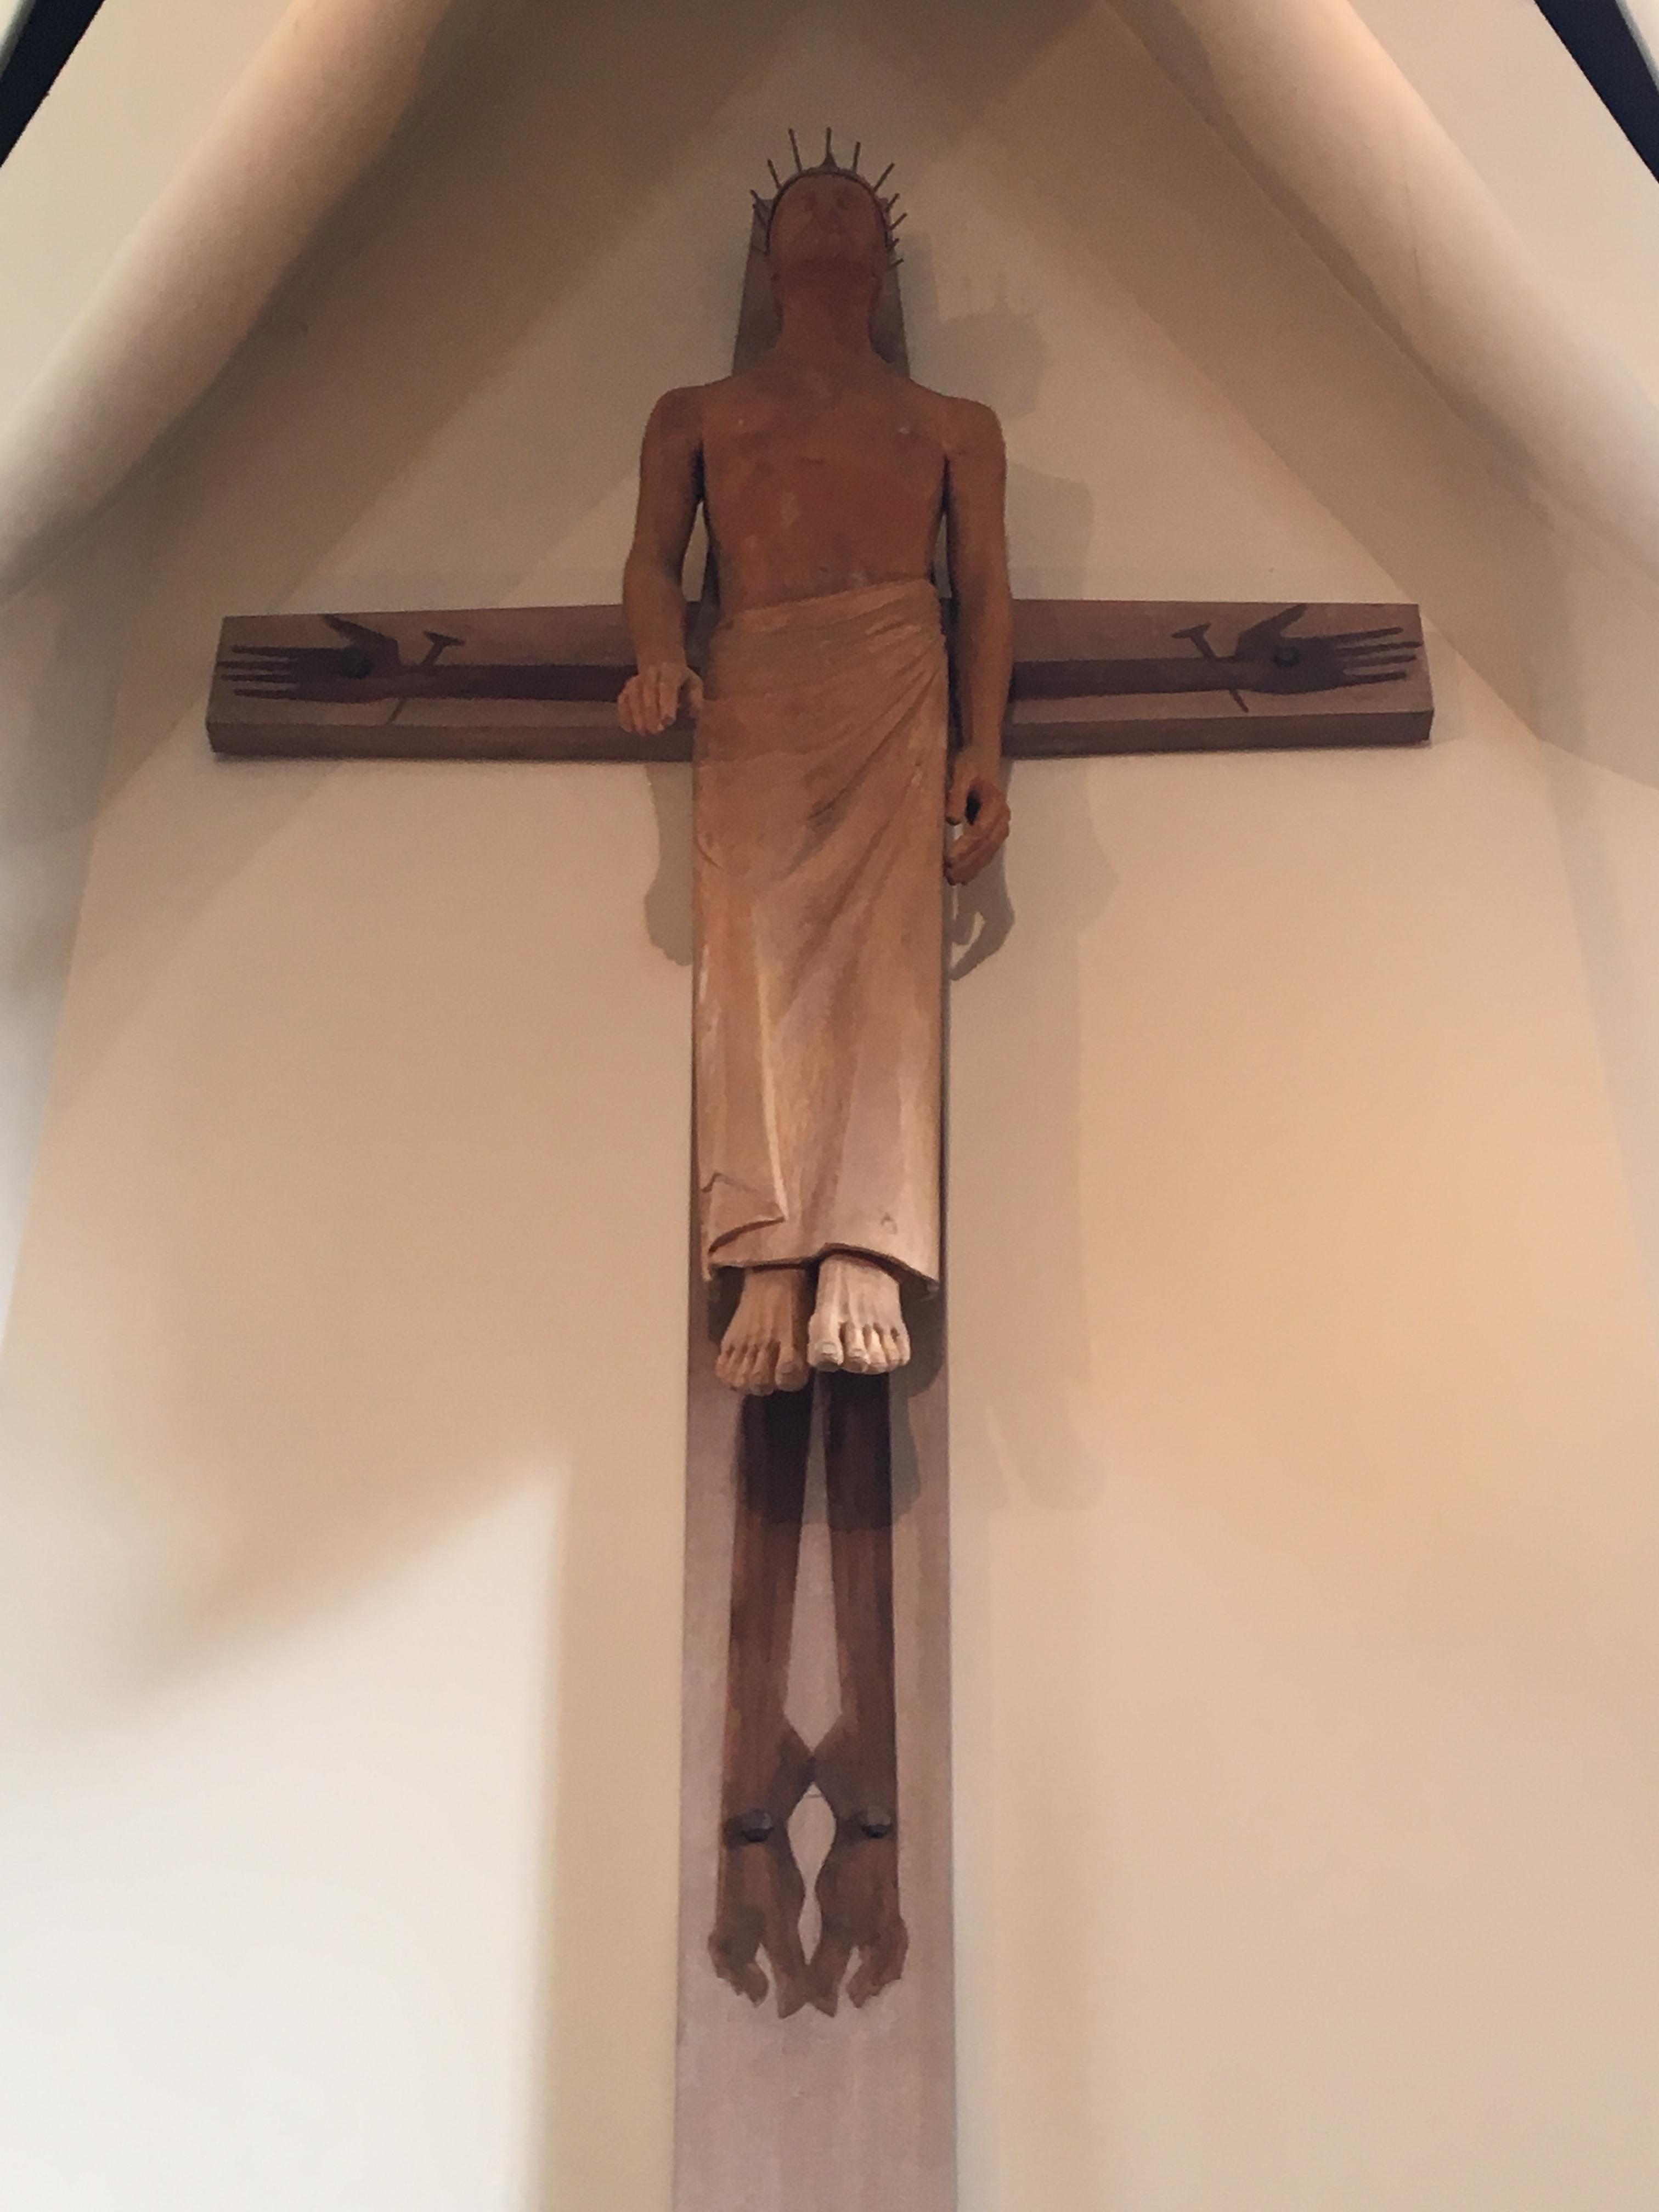 Absence artistic critical essay holocaust holocaust memory presence religion theology